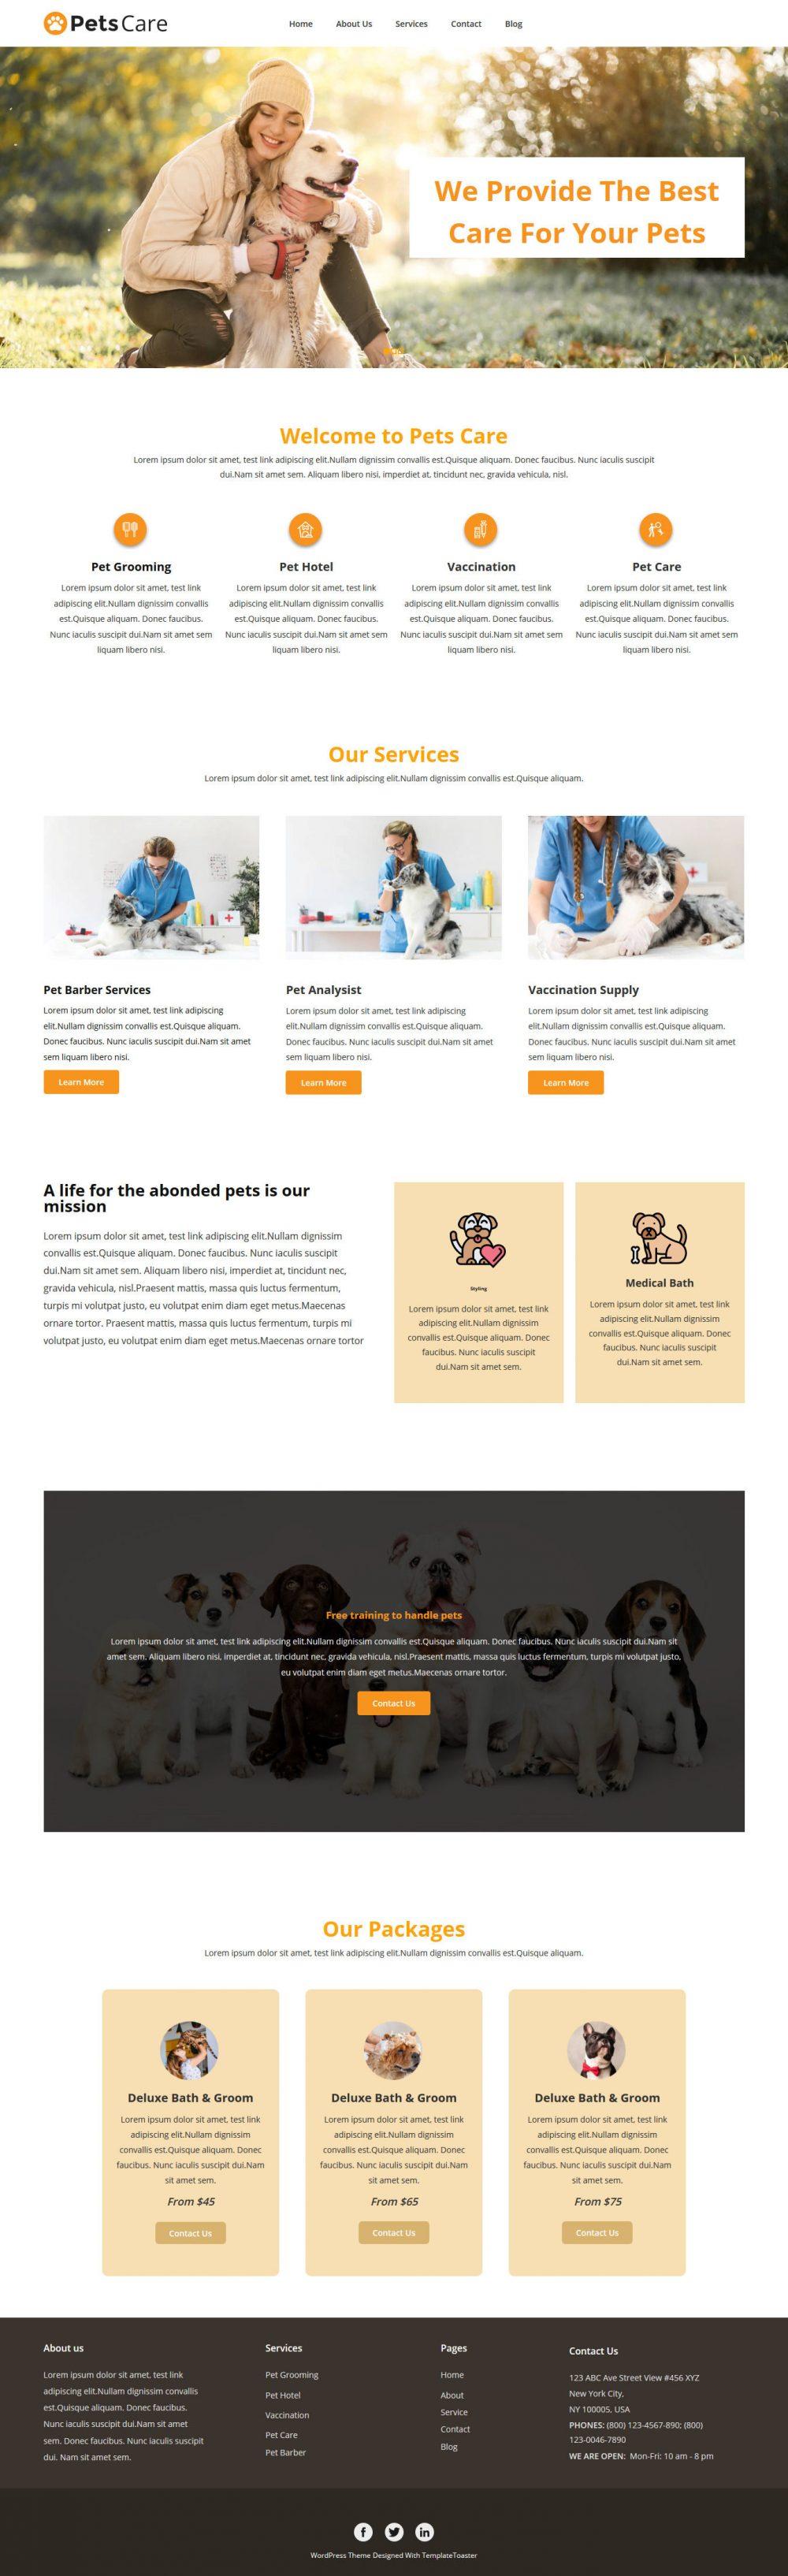 Pets Care Grooming WordPress Theme